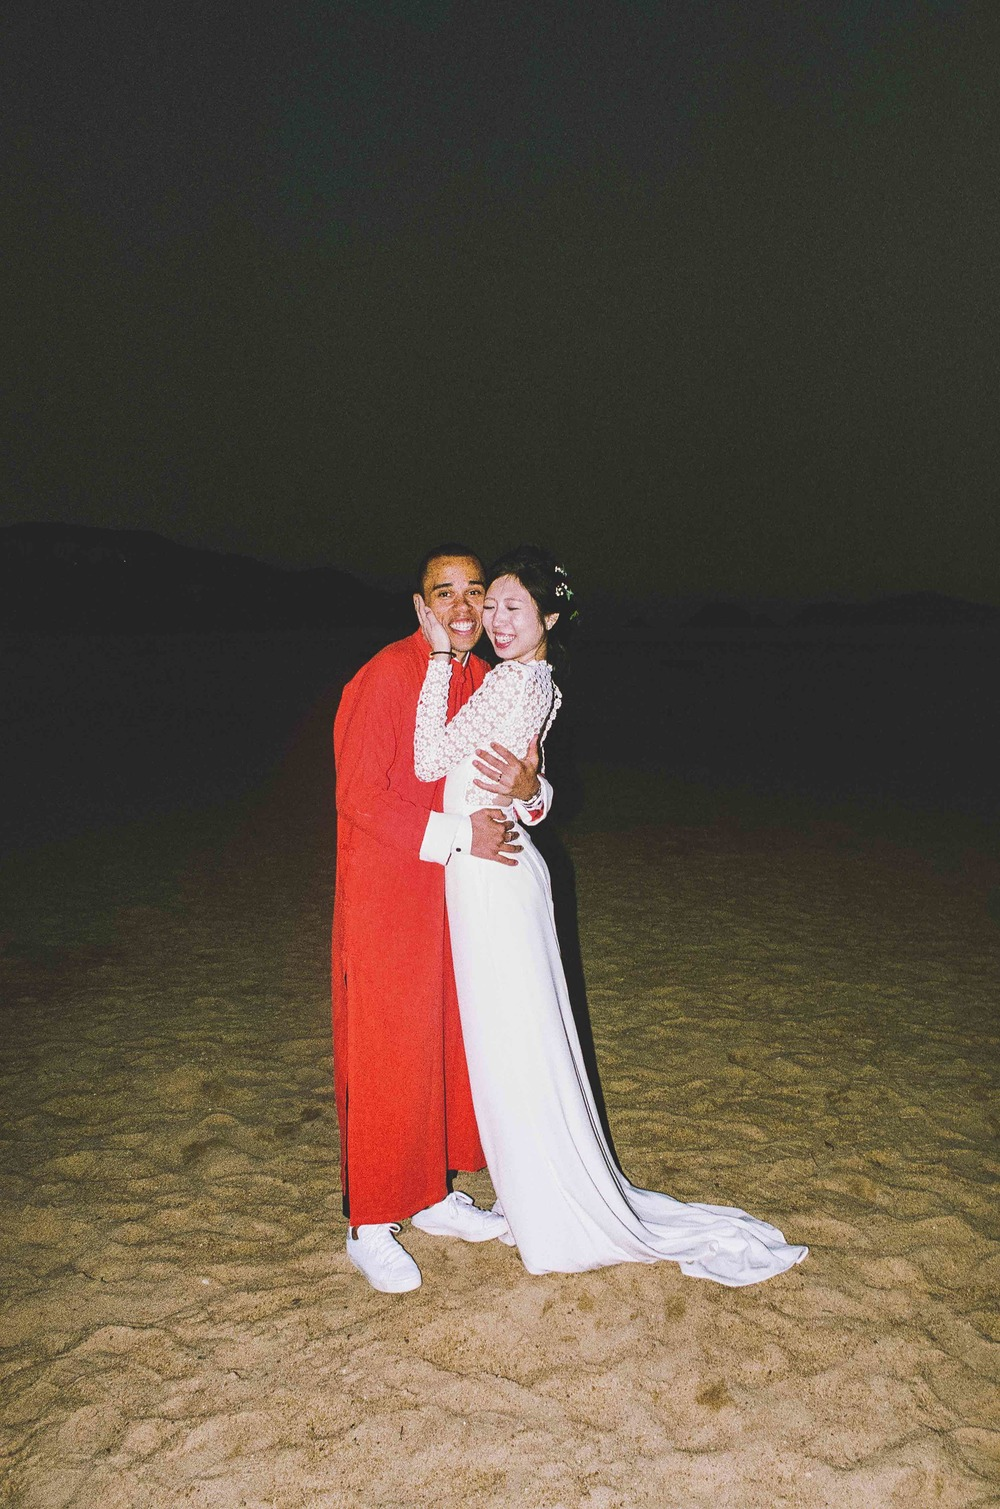 Mr. & Mrs. — rice & shine